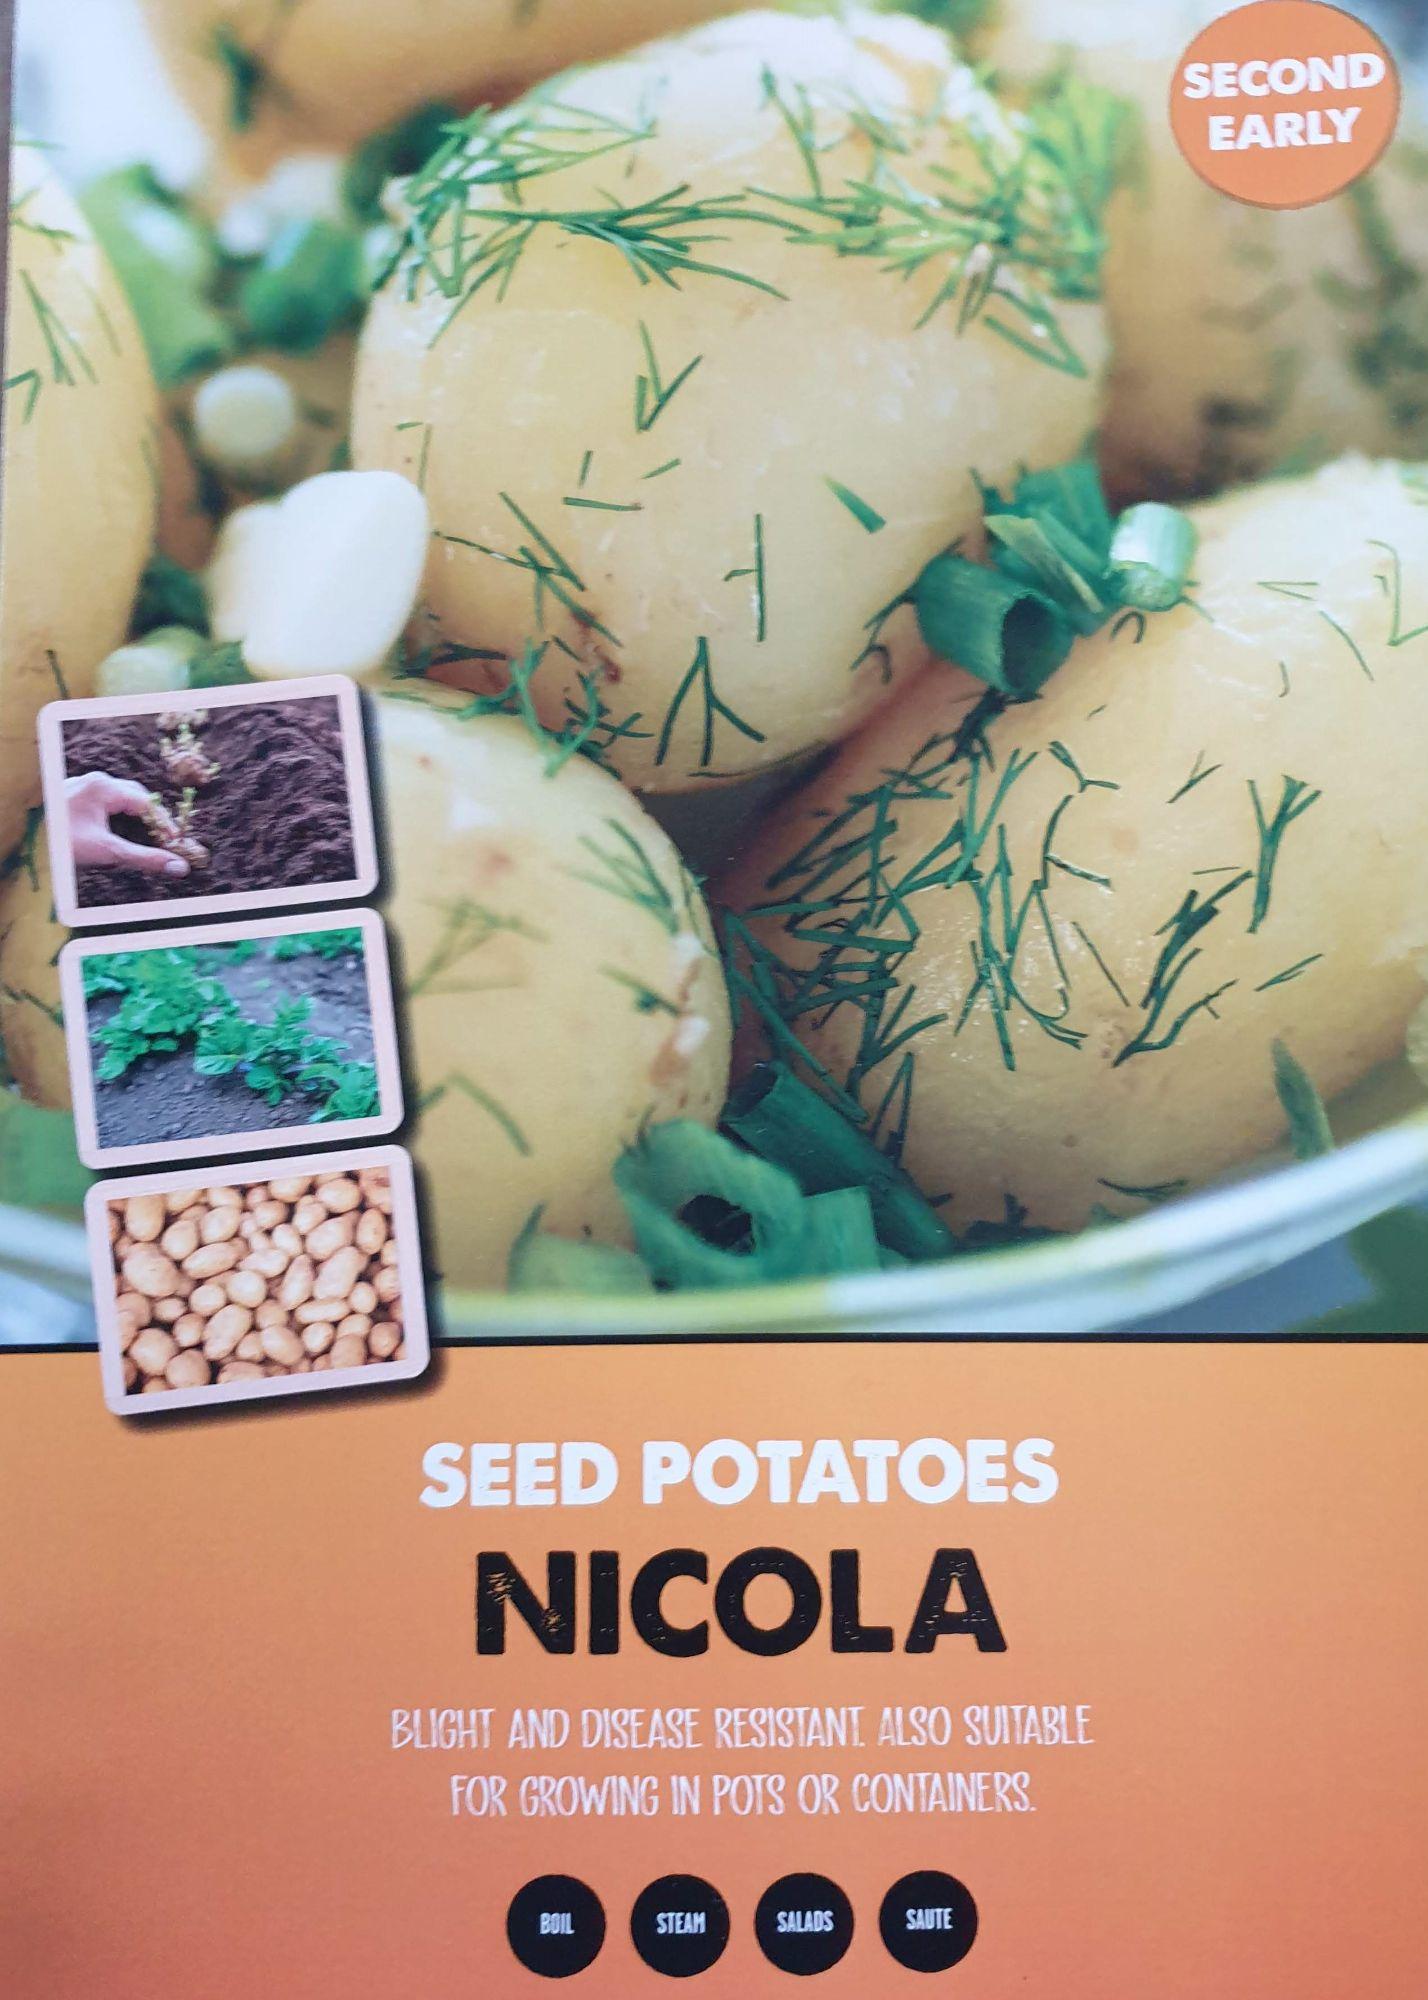 nicola_seed_potato_info.jpg